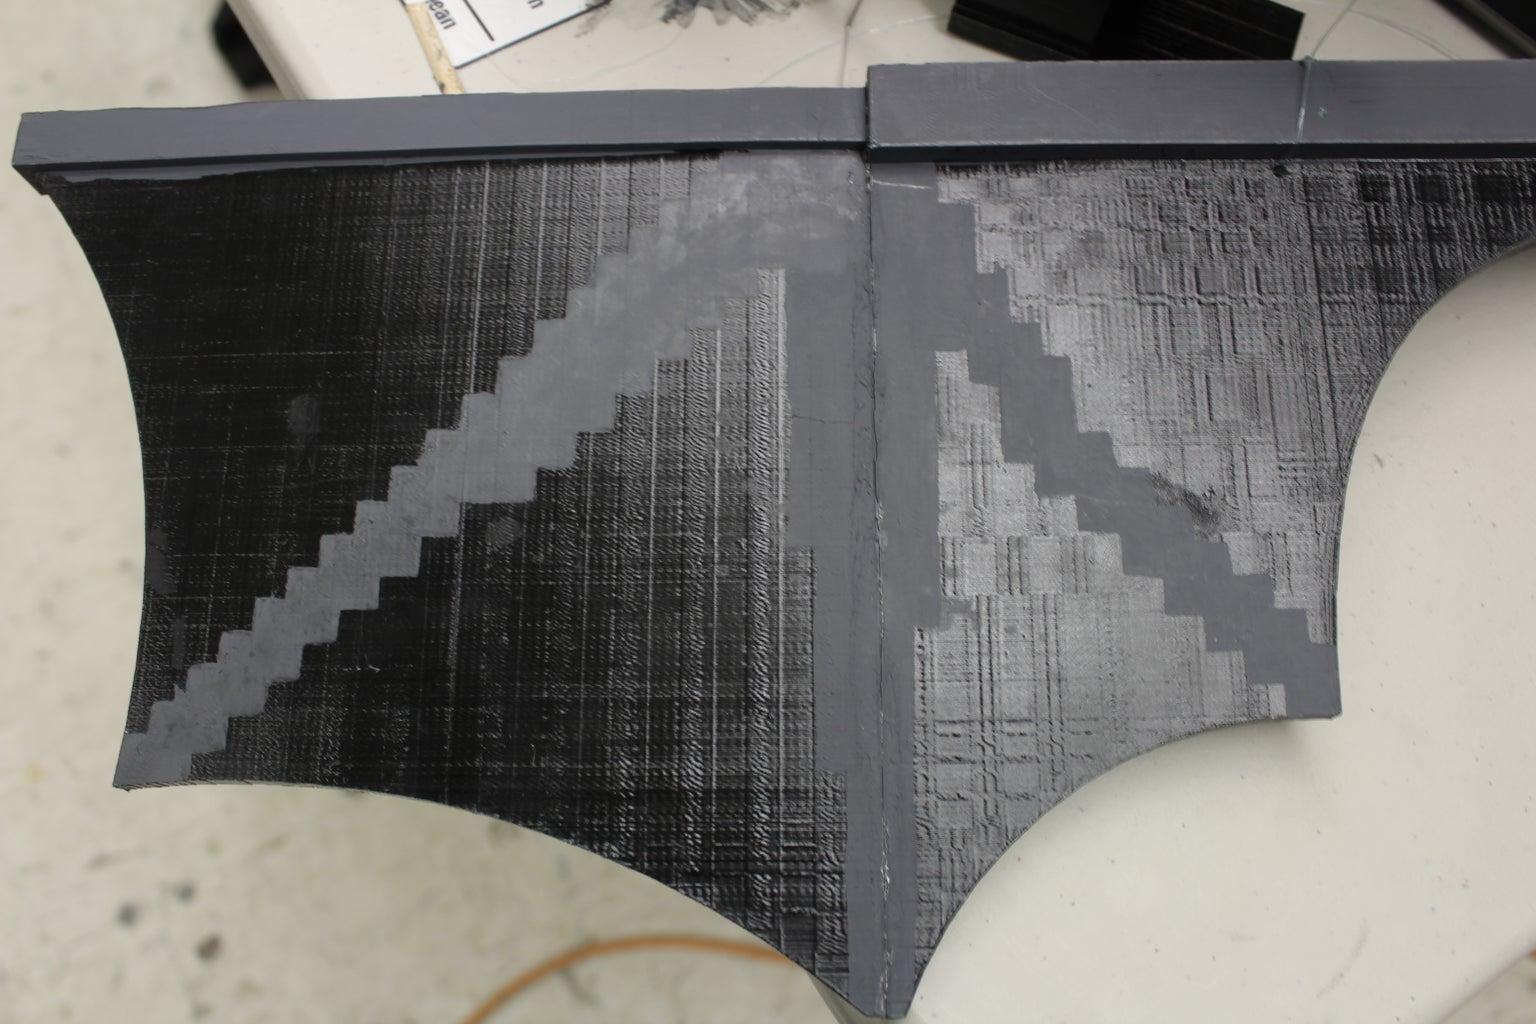 Designing the Ender Dragon